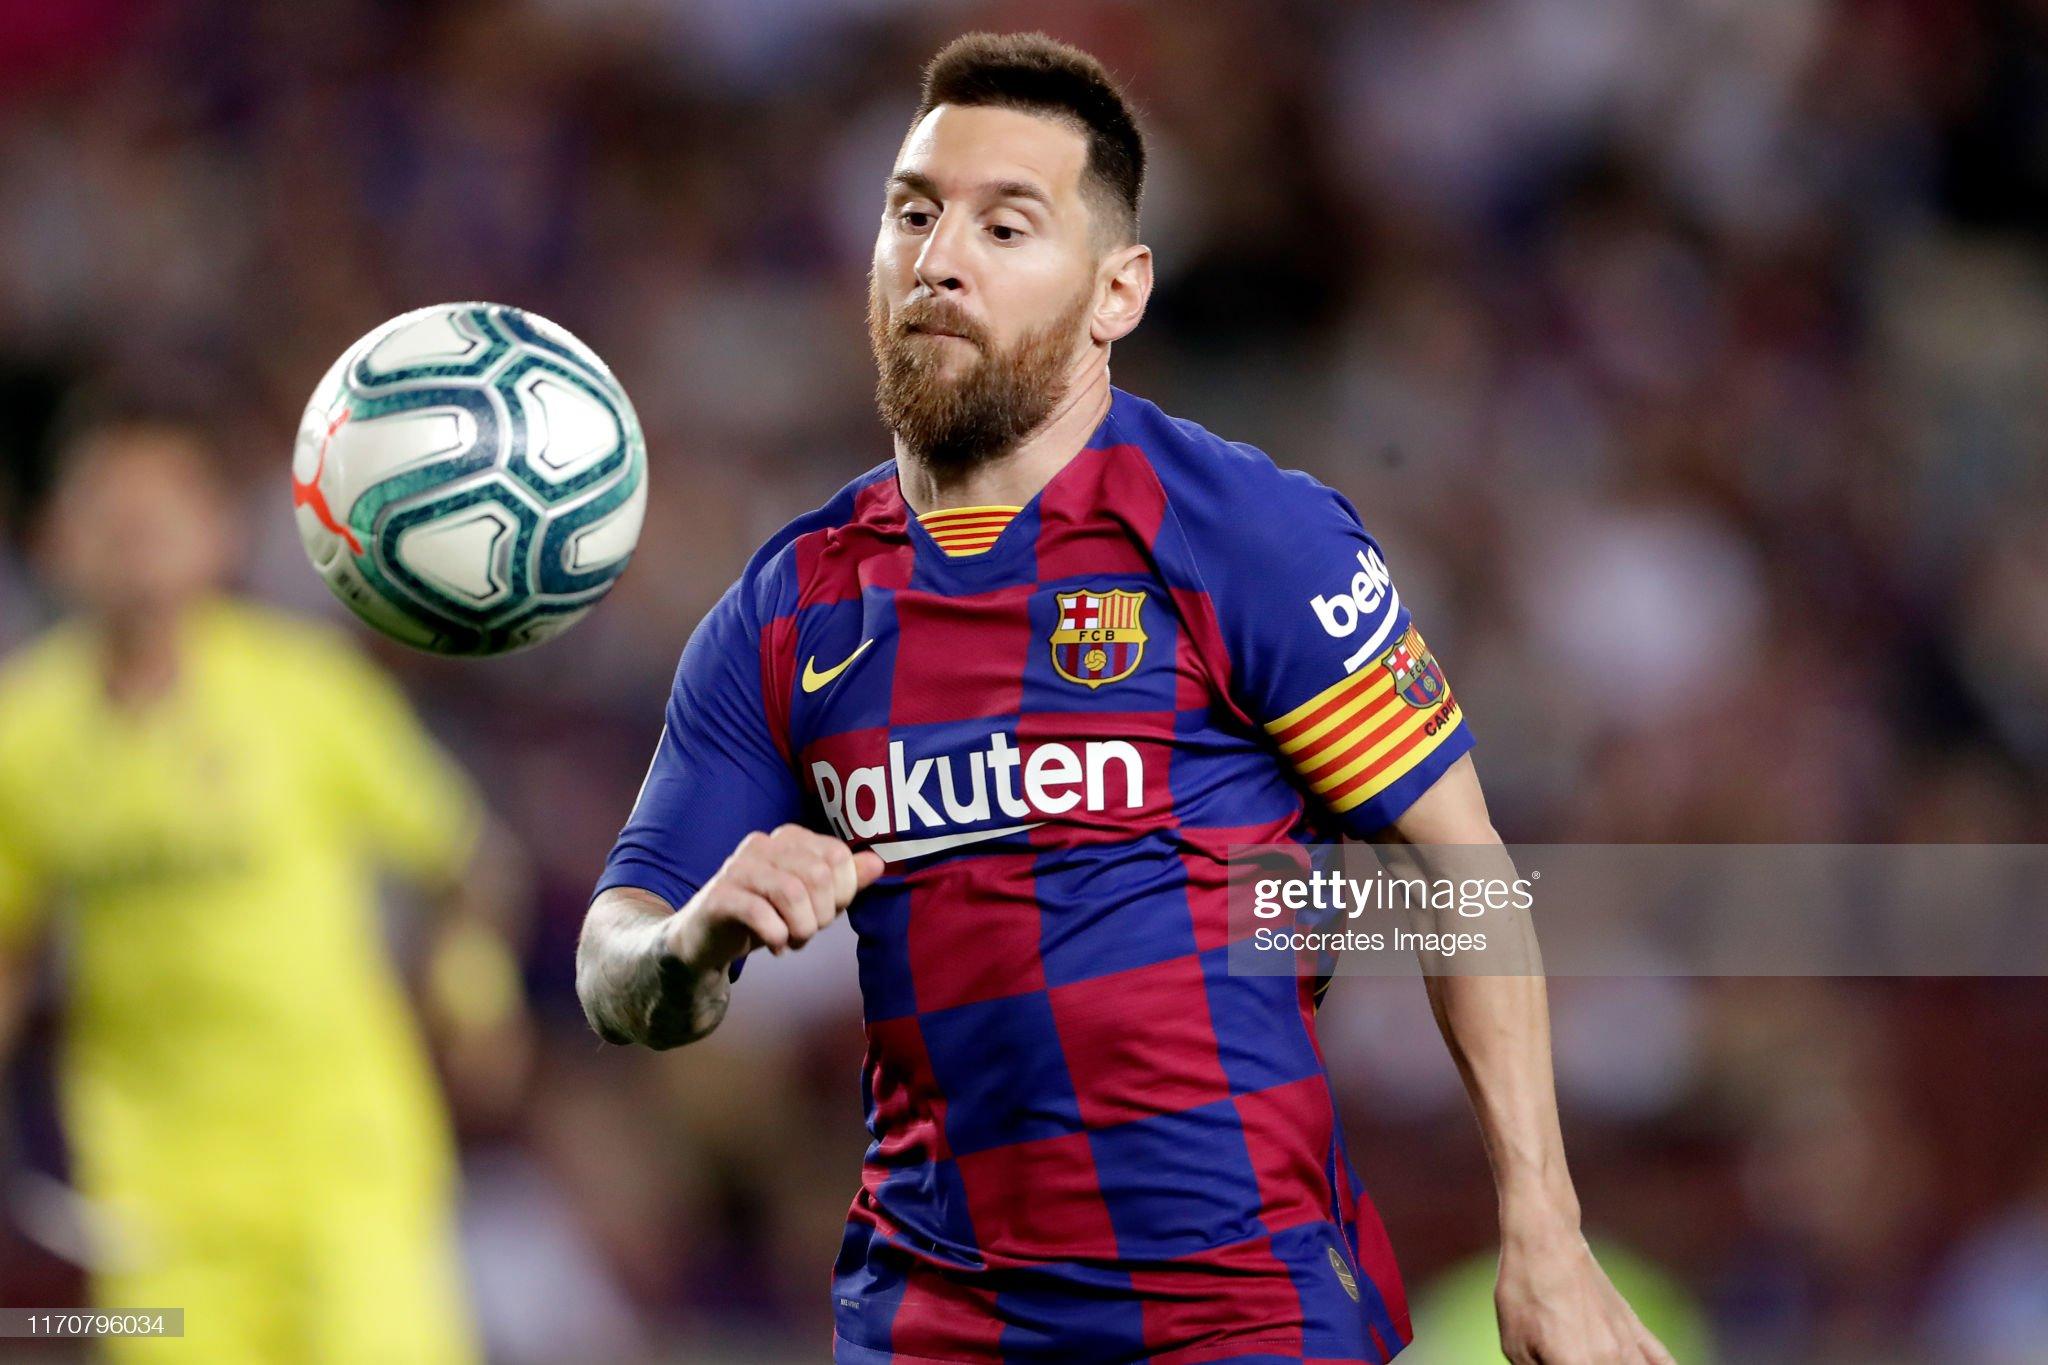 صور مباراة : برشلونة - فياريال 2-1 ( 24-09-2019 )  Lionel-messi-of-fc-barcelona-during-the-la-liga-santander-match-fc-picture-id1170796034?s=2048x2048